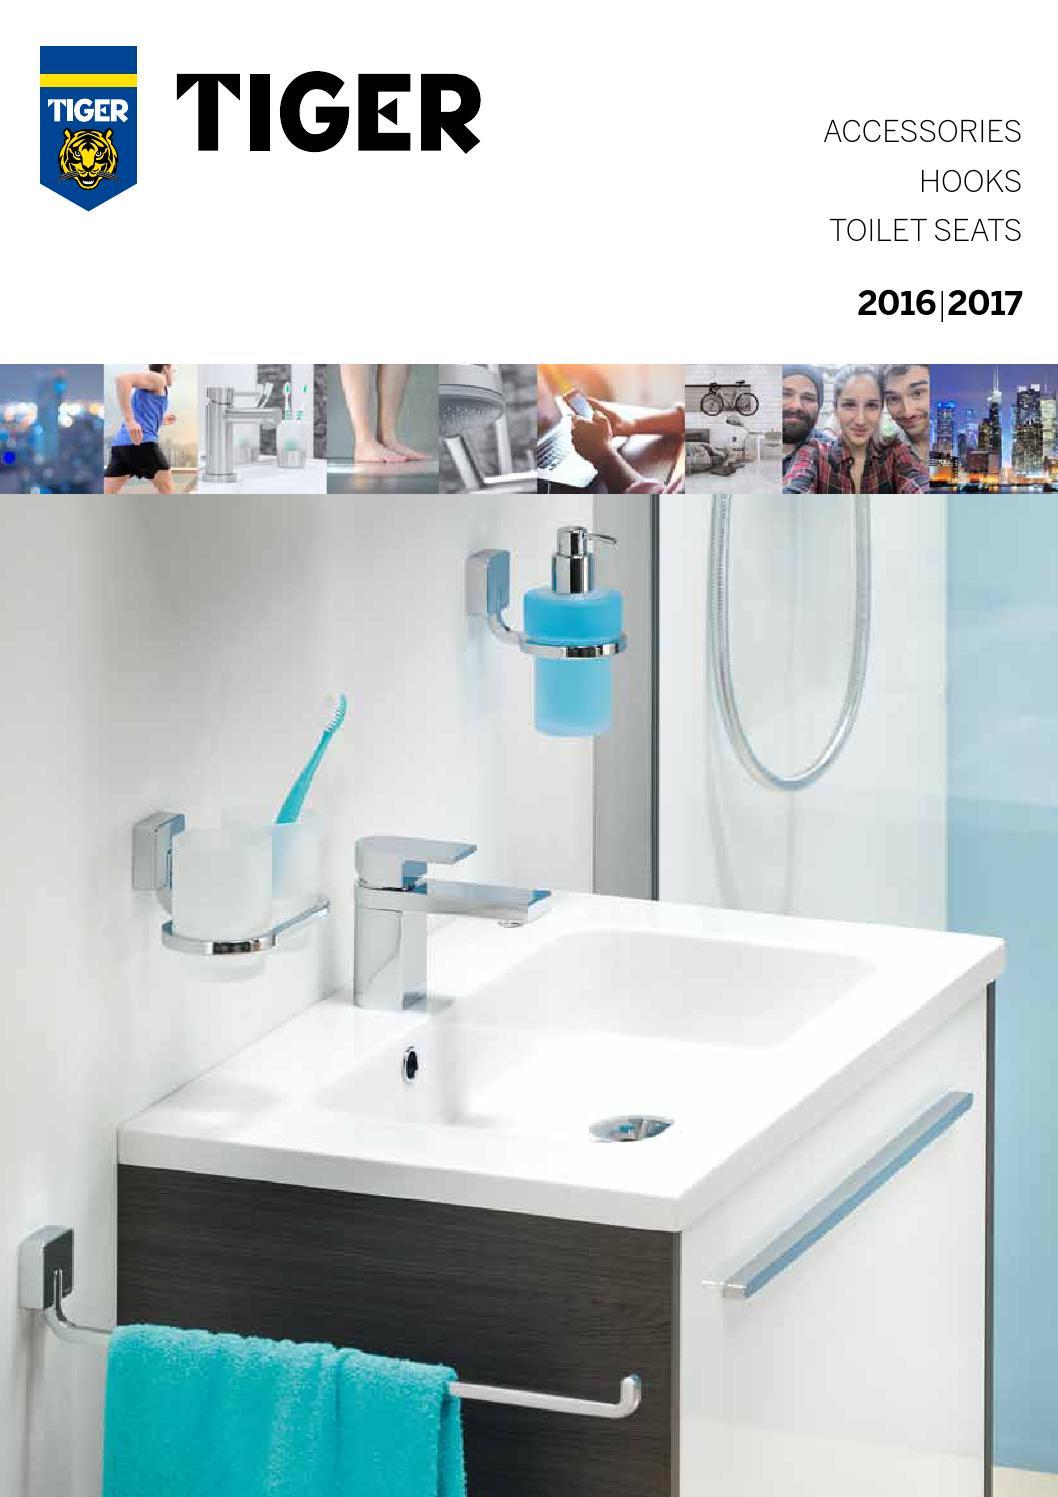 Tiger Bathroom Design Magazine 2016 Accessories Hooks